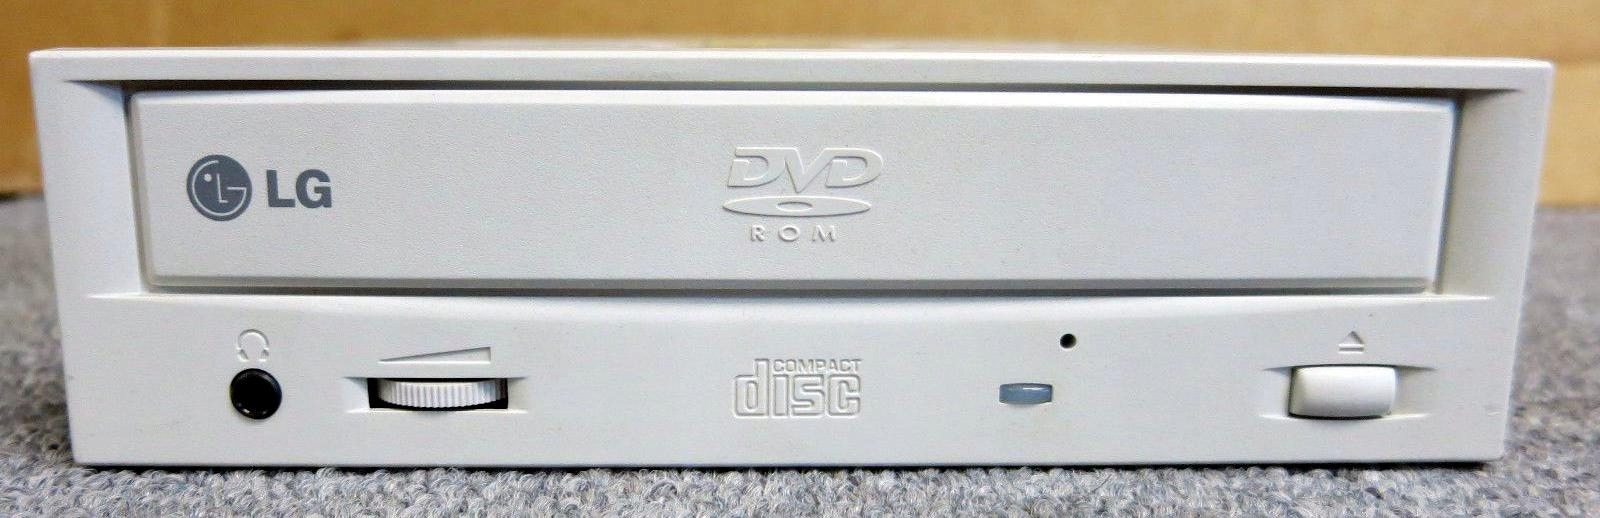 LG GDR-8161B 64BIT DRIVER